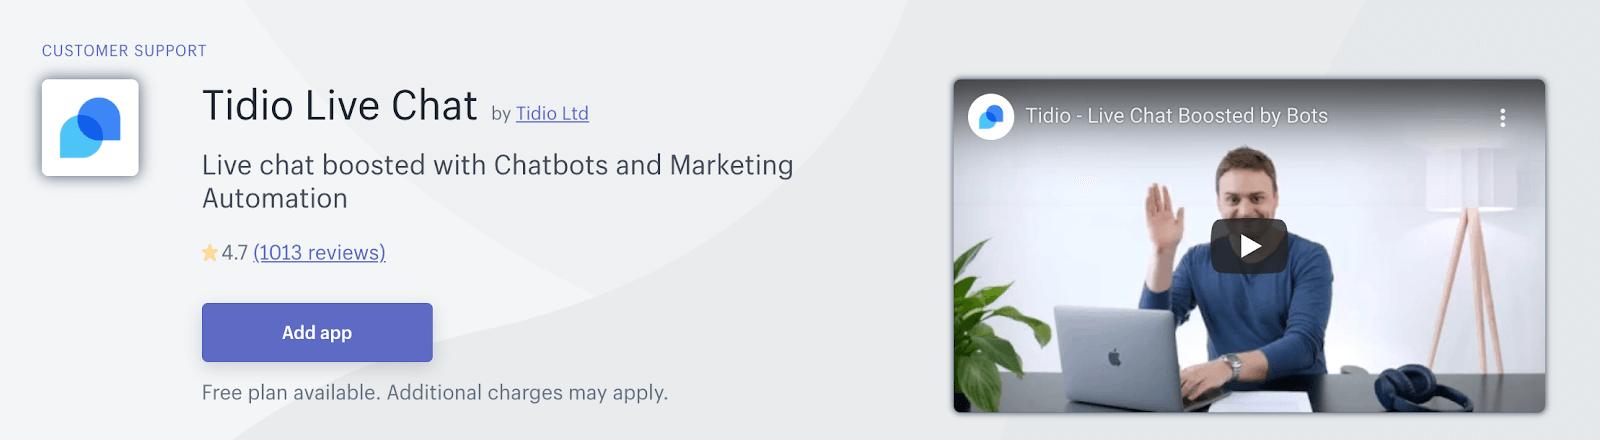 Shopify application - Tidio Live Chat